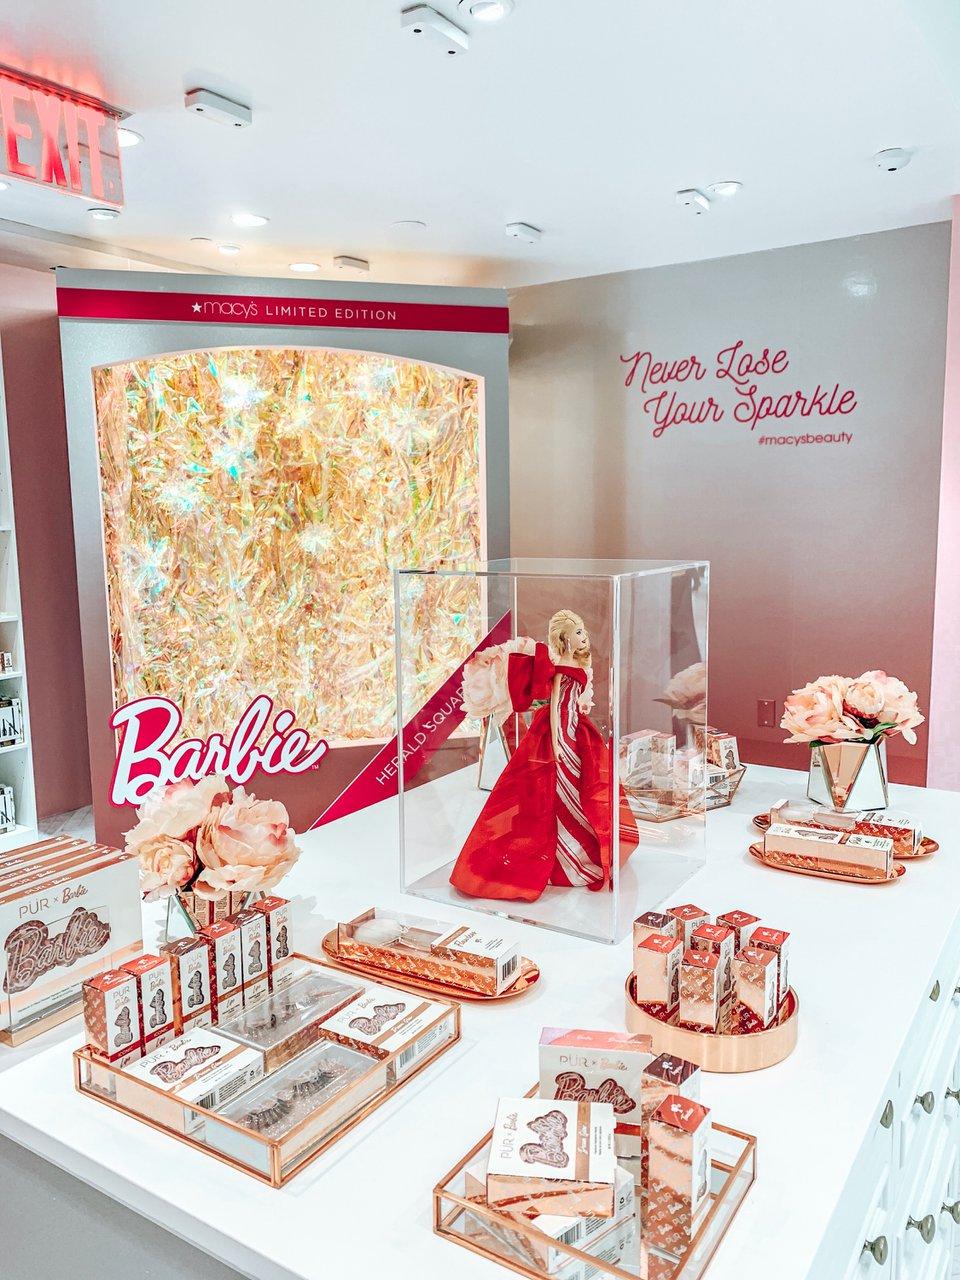 Macy's  Barbie x PUR Cosmetics  photo IMG_2162.jpg